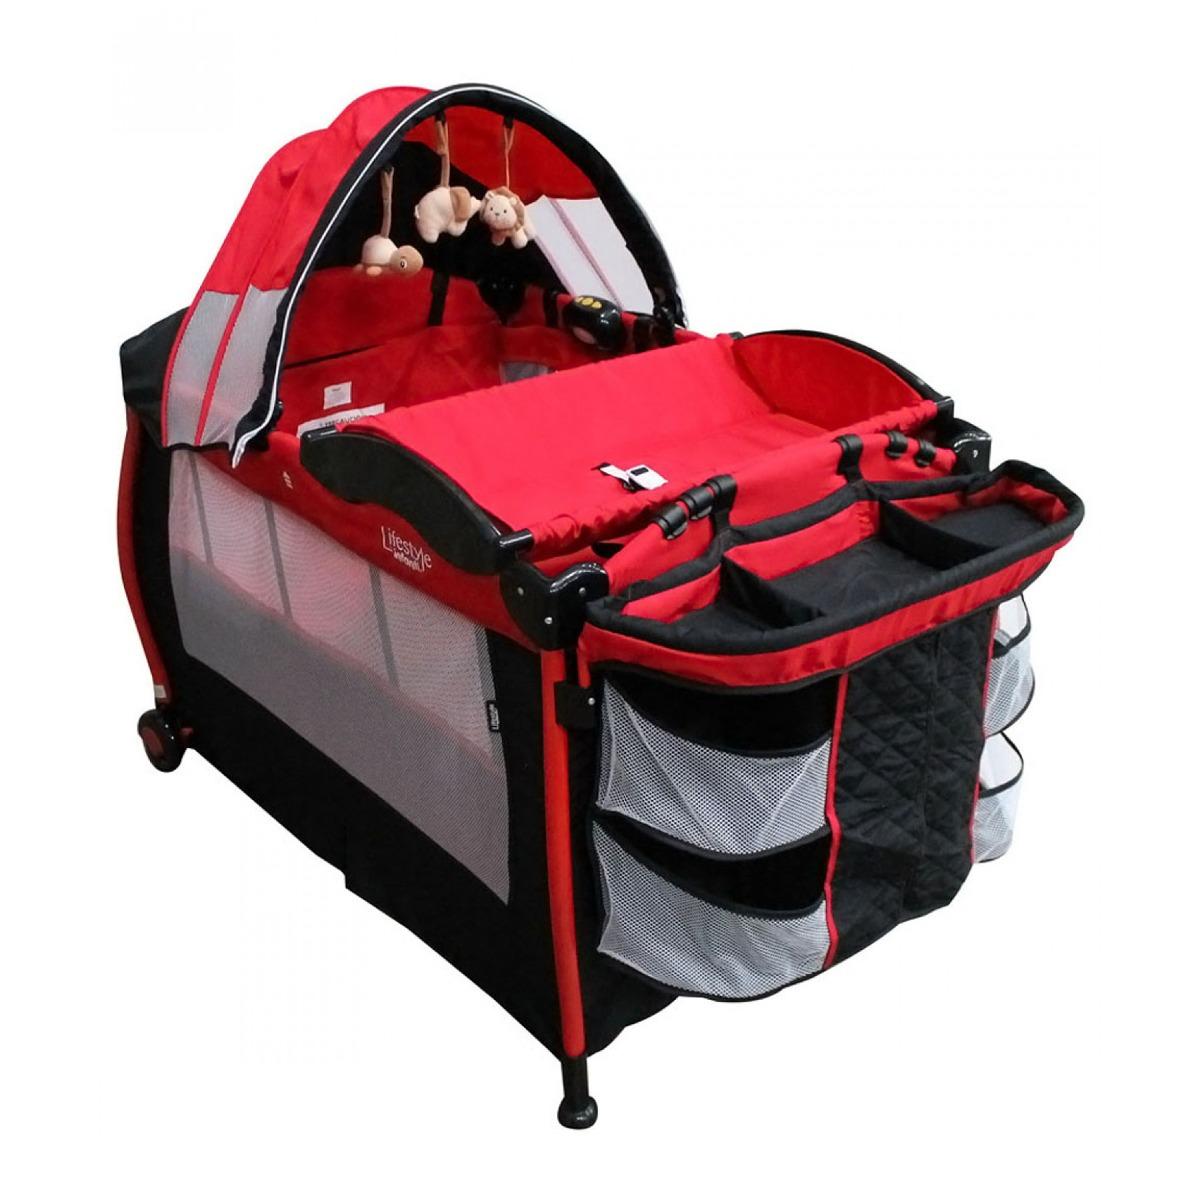 Cuna Cama Bebe Viaje Infanti Padres Ion Negro Rojo - $ 3,779.00 en ...